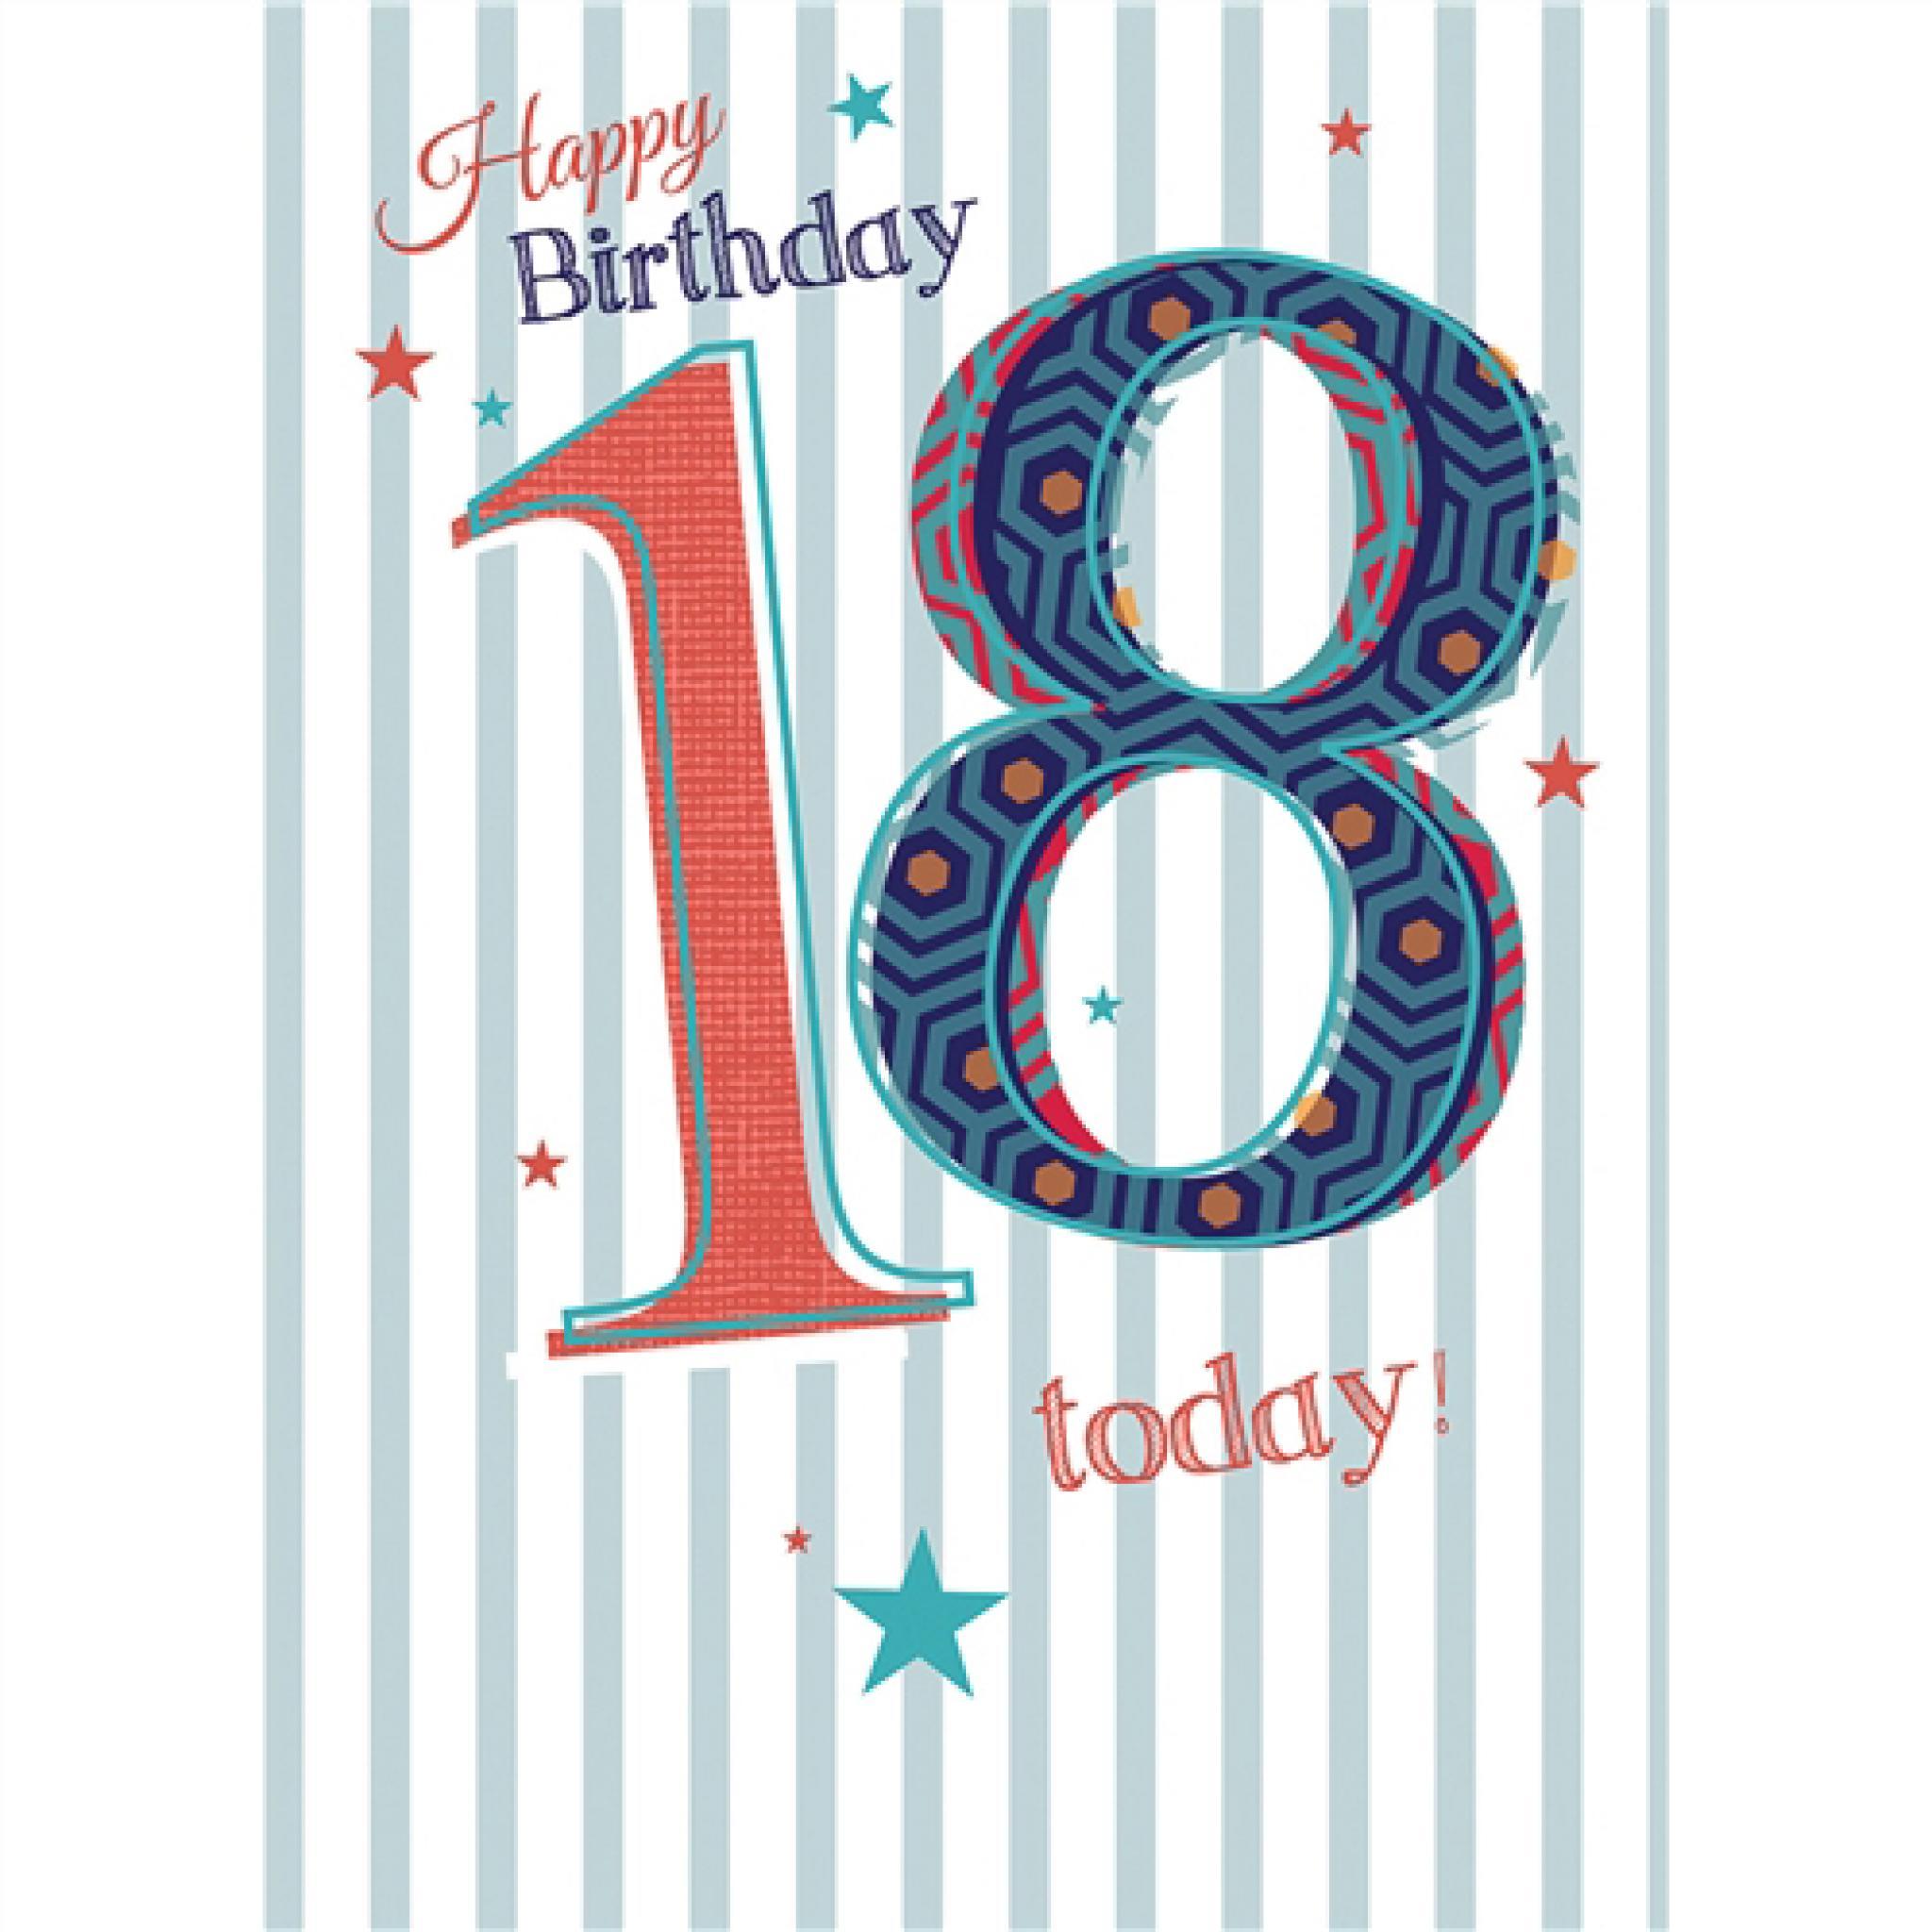 Enjoyable Special Birthdays Card 18 Male Personalised Birthday Cards Paralily Jamesorg